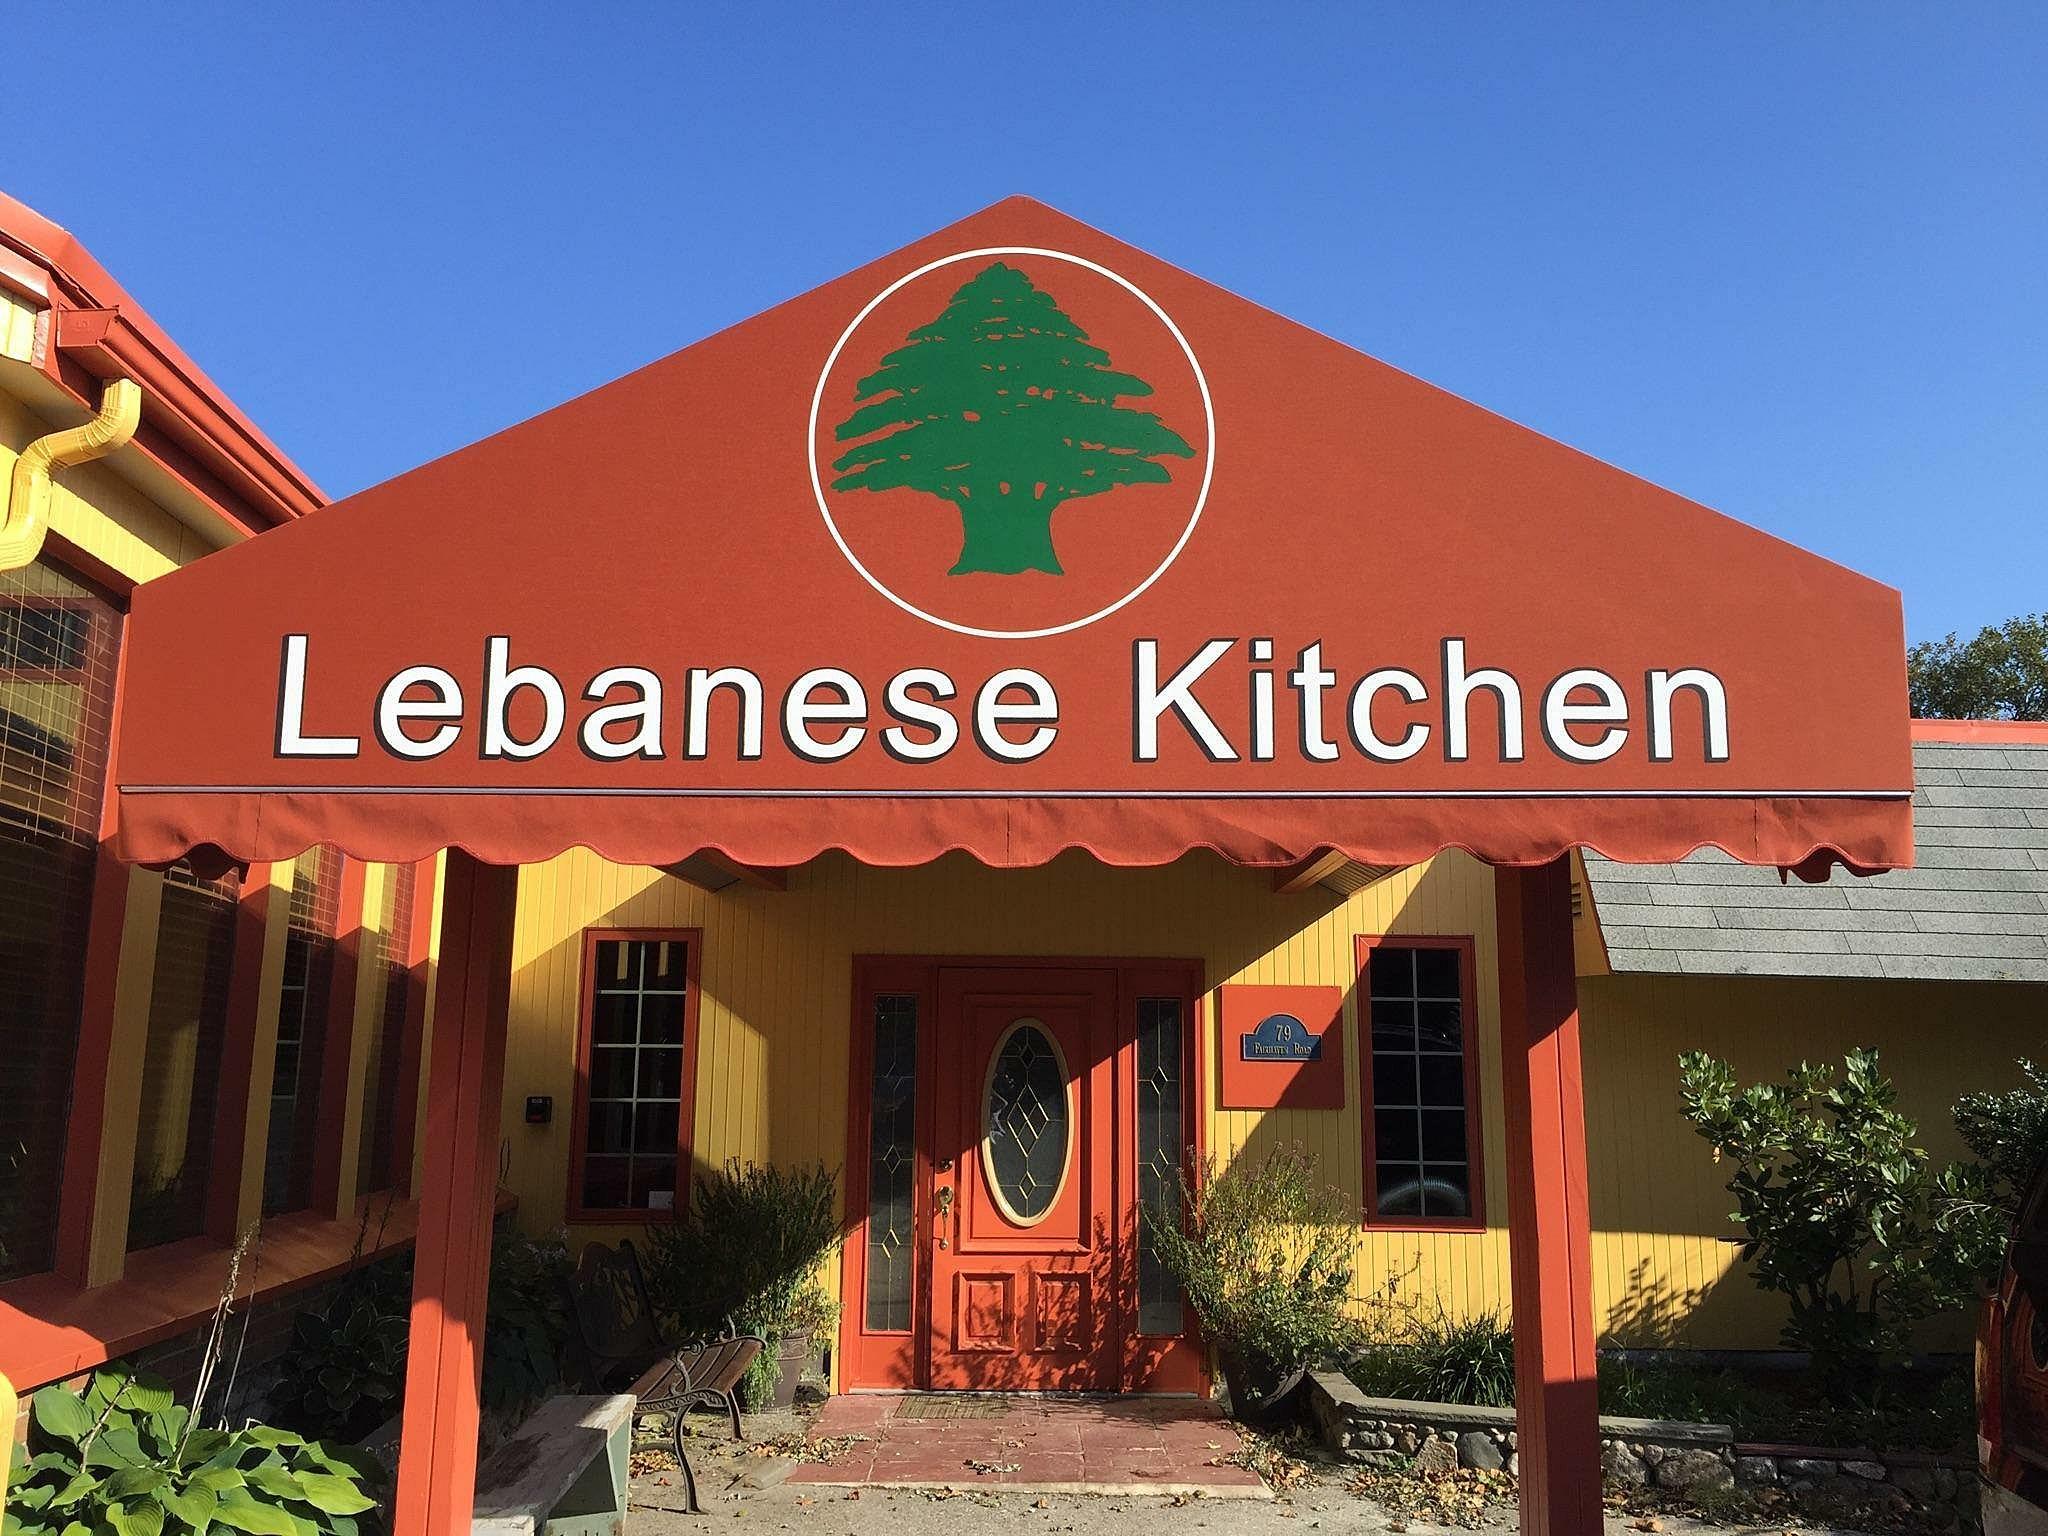 evidence that mattapoisetts lebanese kitchen is opening soon - Lebanese Kitchen